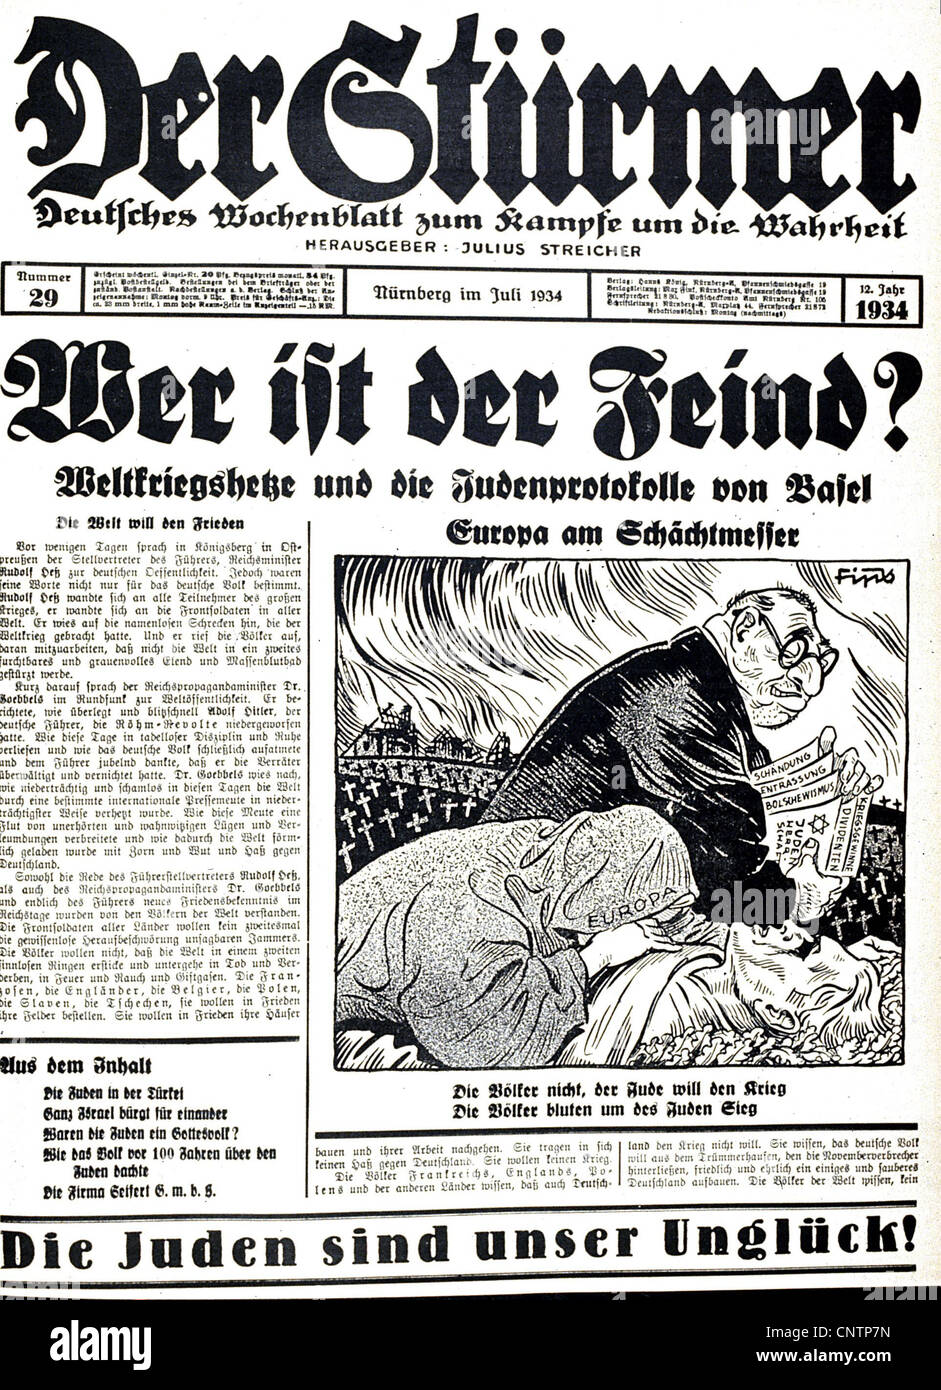 National Socialism / Nazism, propaganda, press / media, 'Der Stuermer', No. 29, July 1934, front page, headline: - Stock Image